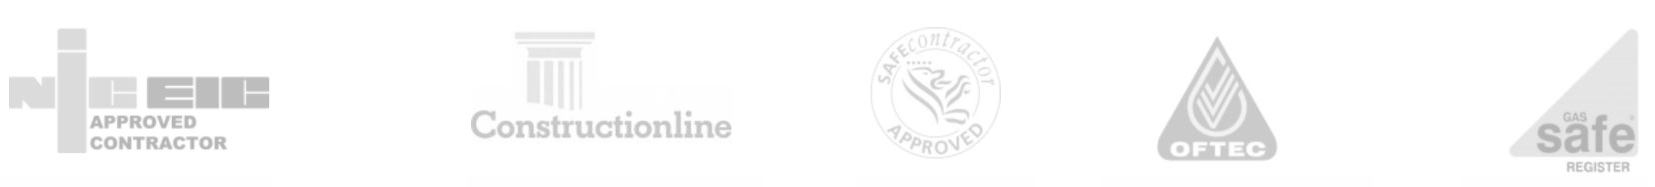 logo_placeholder